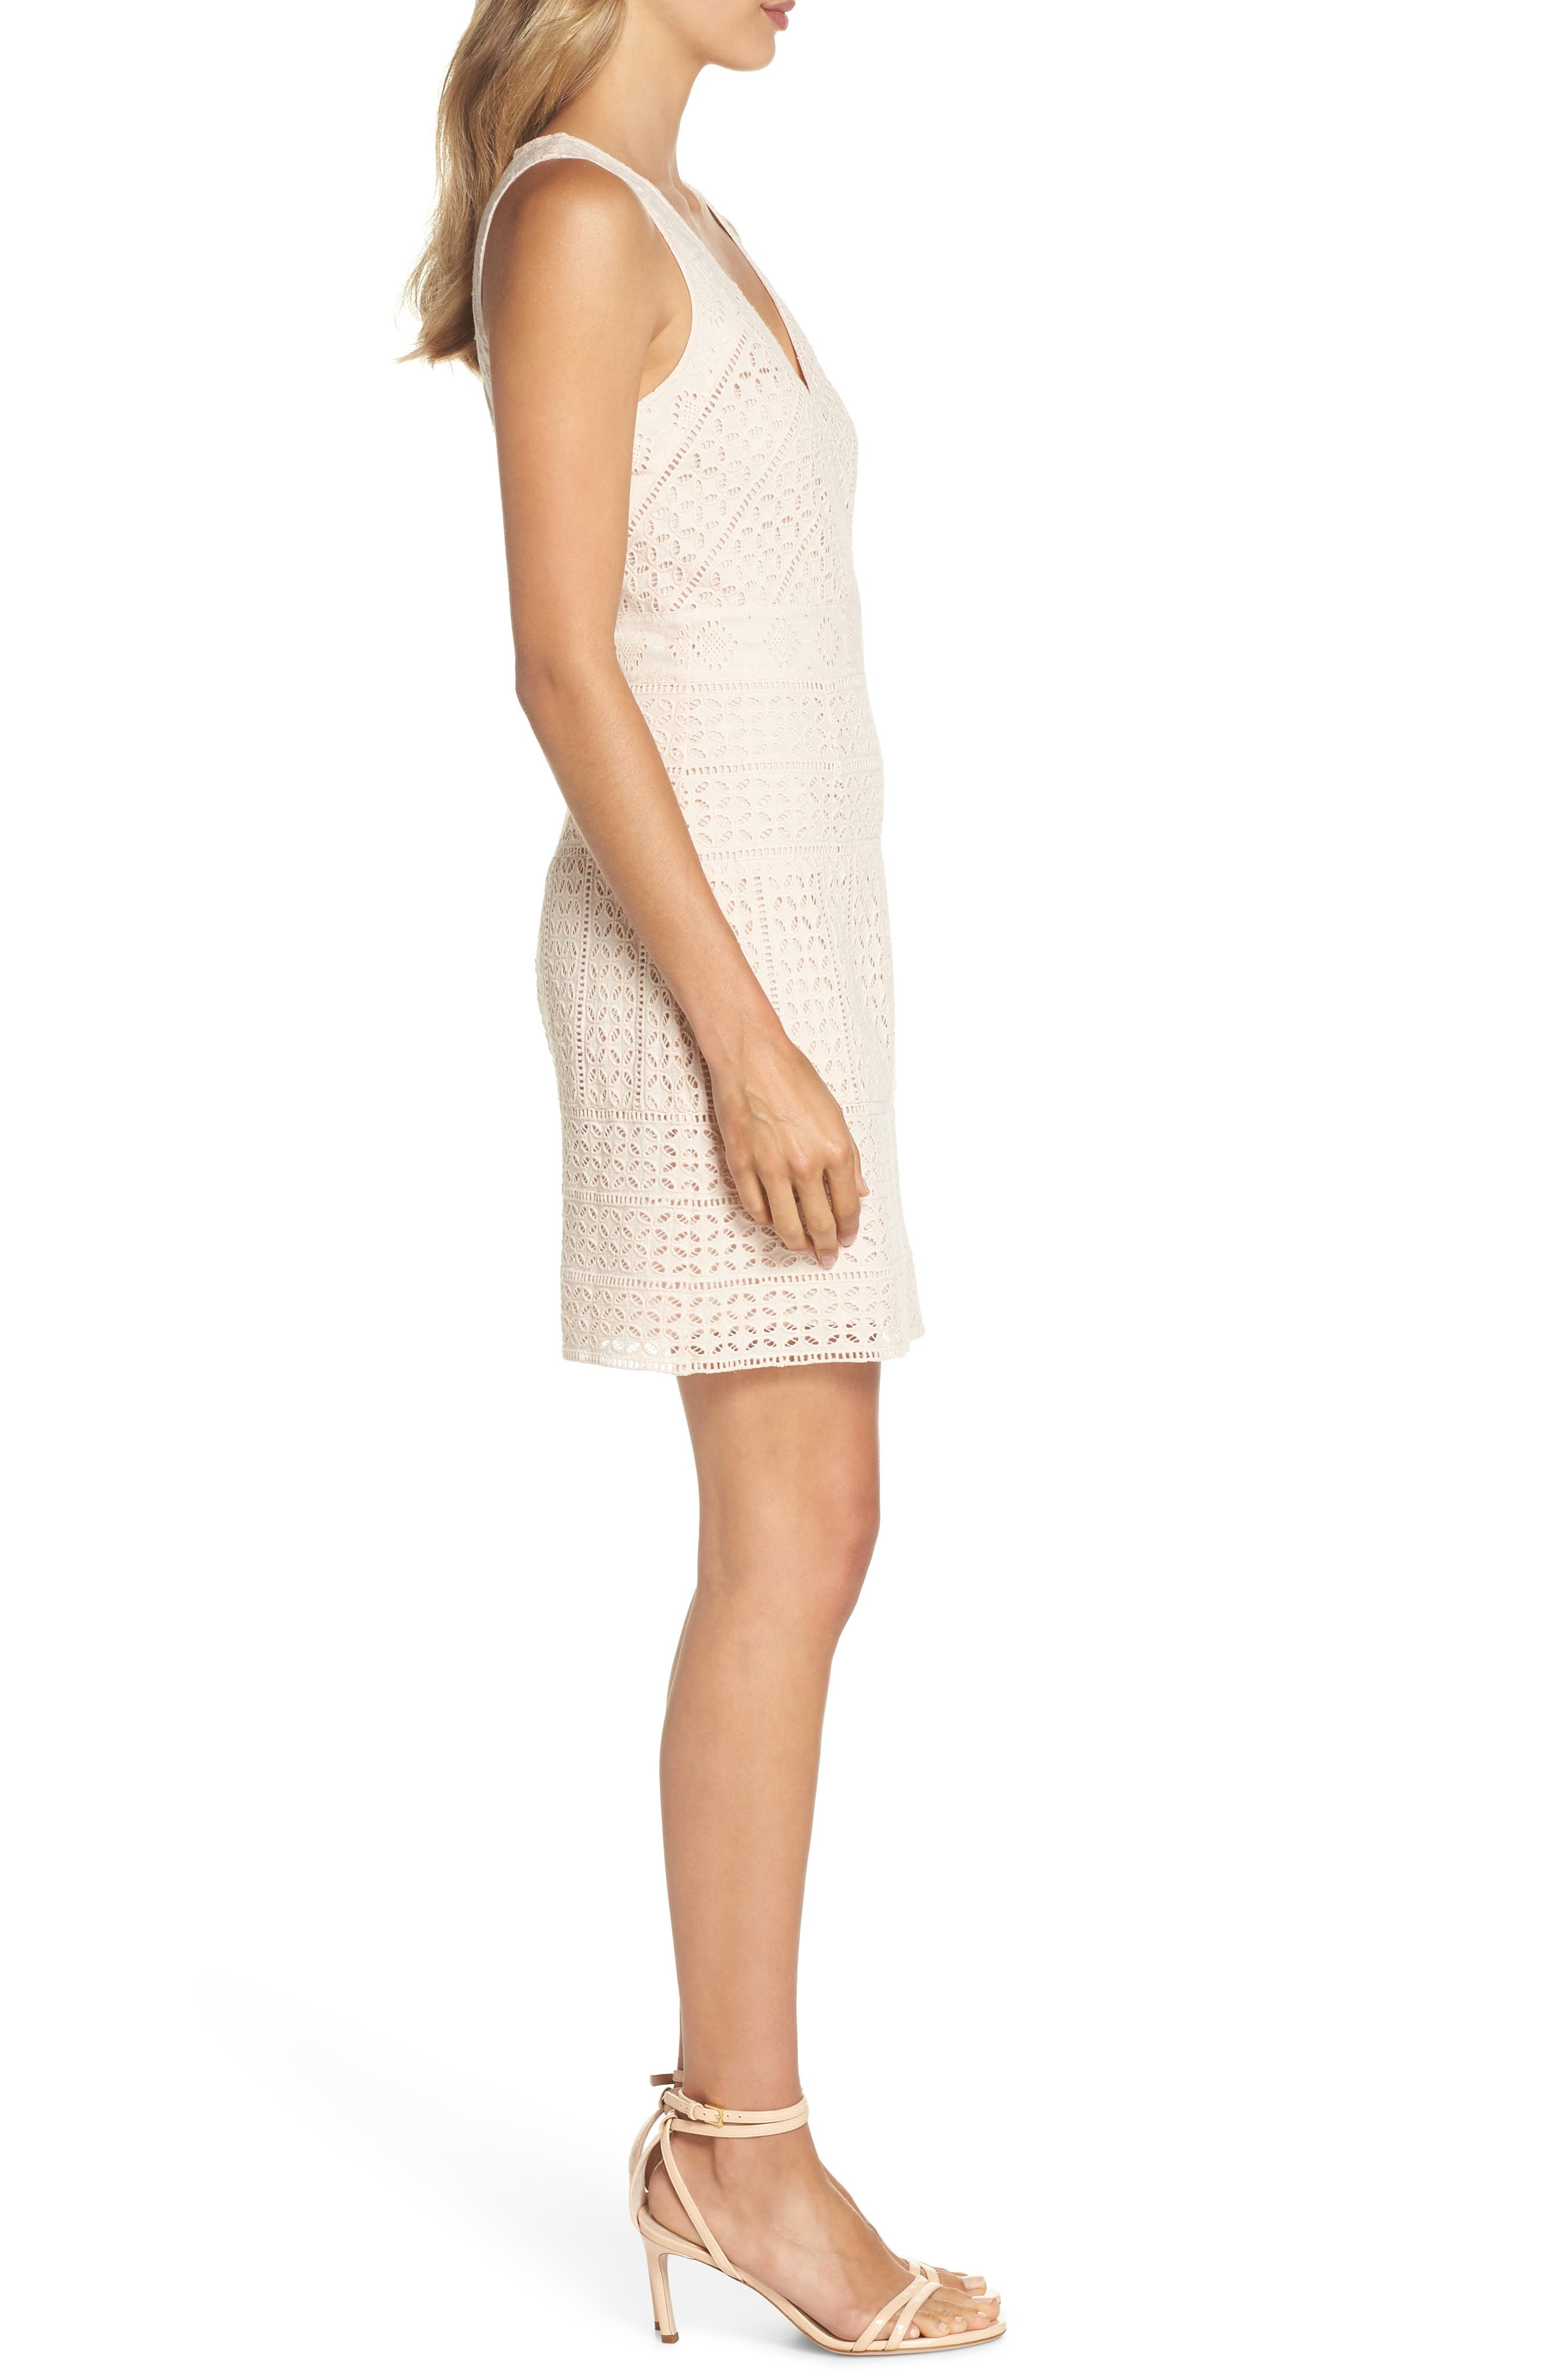 Schiffley Summer Cage Cotton Dress,                             Alternate thumbnail 3, color,                             687